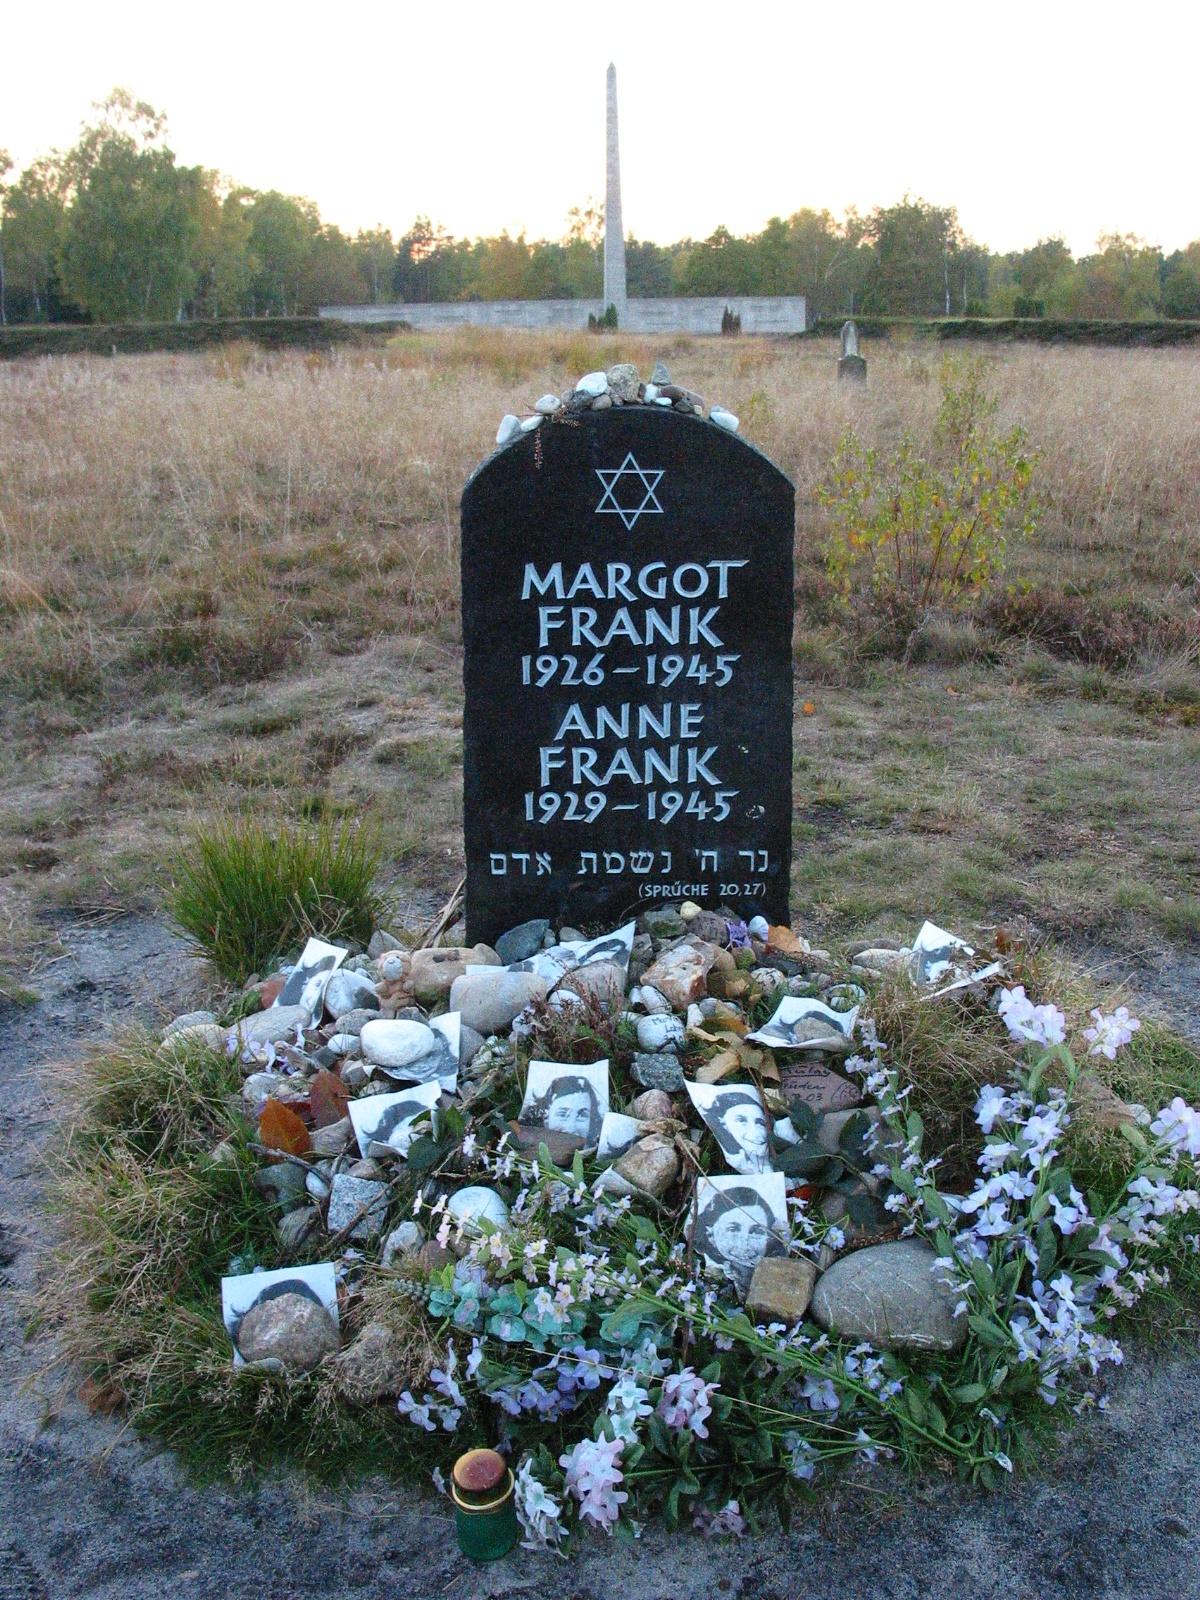 Anne_frank_memorial_bergen_belsen.jpg